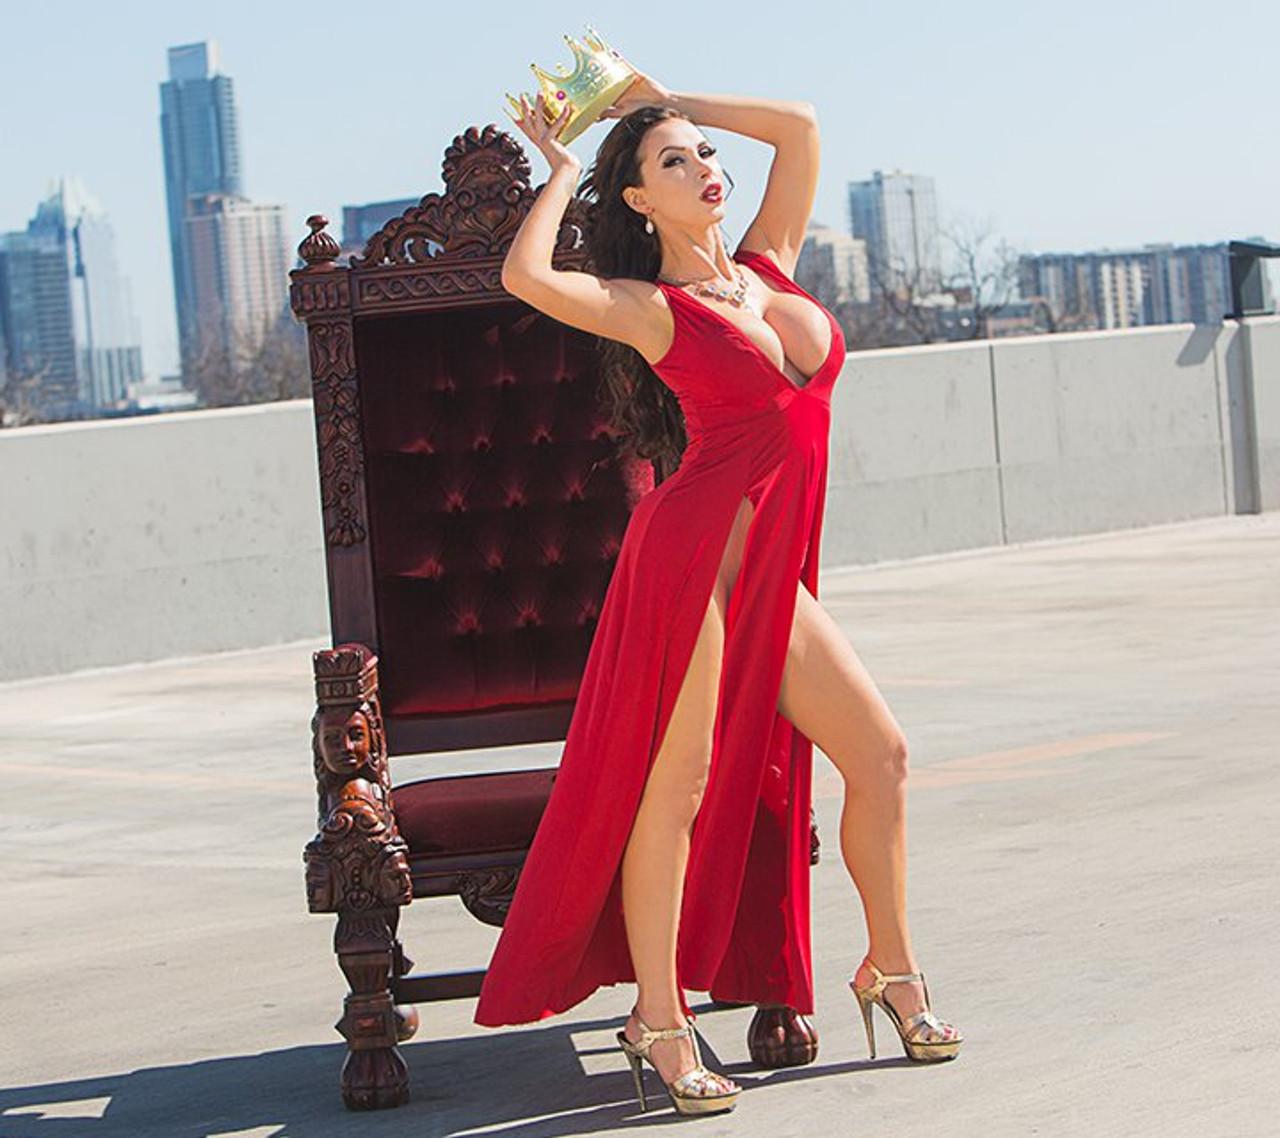 Buy the FleshLight Girls Nikki Benzs Vagina MVP Sensation